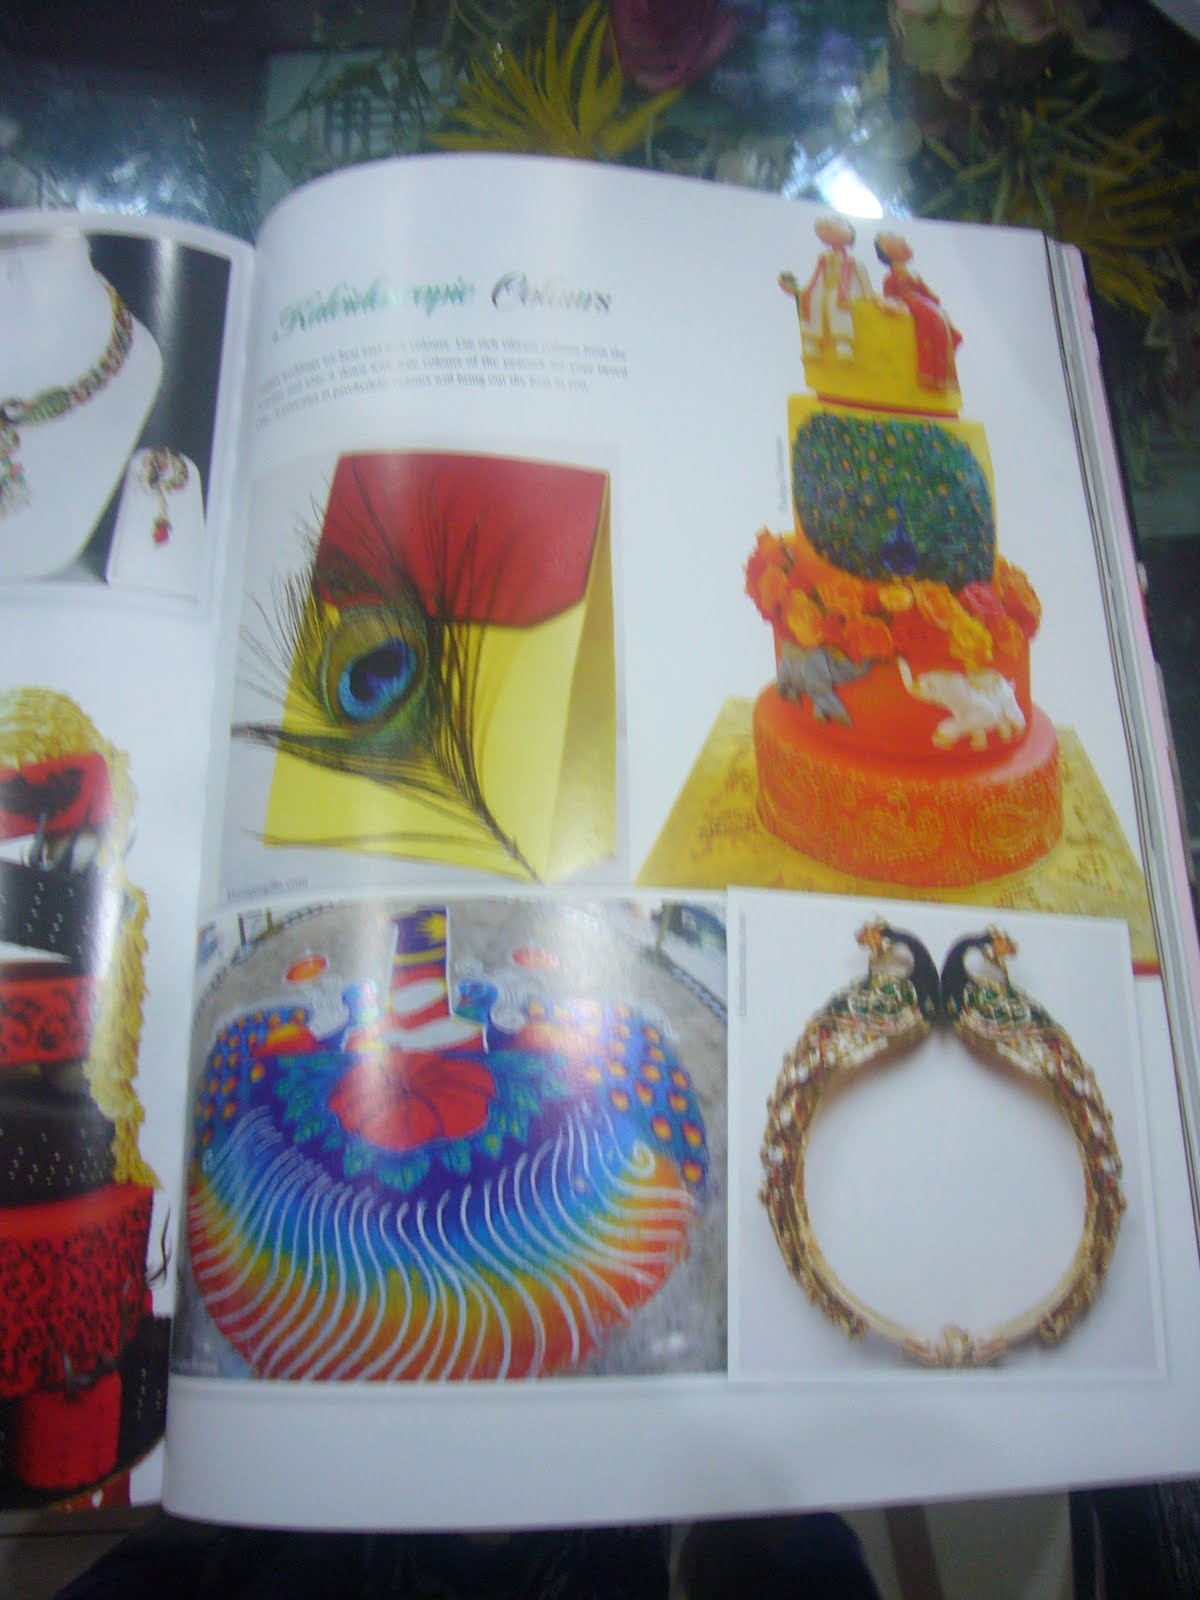 SIMPLY DELICIOUS CAKES Shaadi Magazine Vol 9